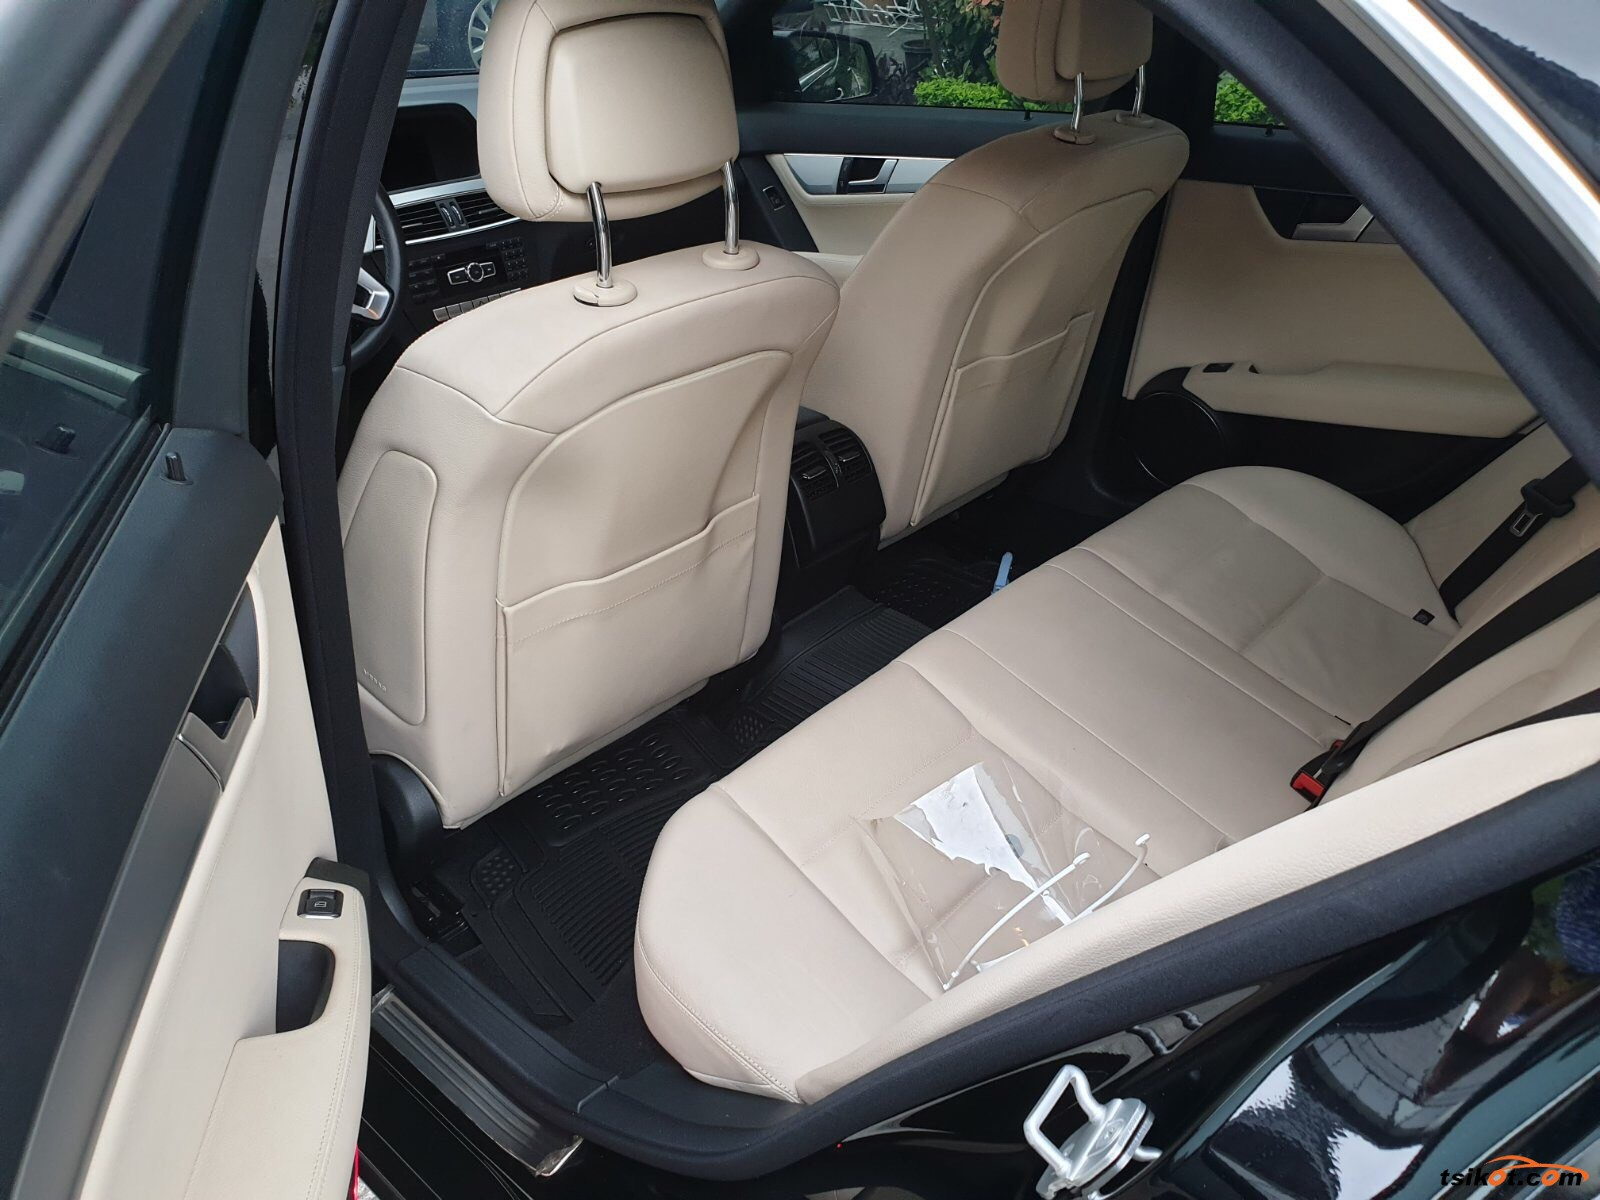 Mercedes-Benz 200 2013 - 1